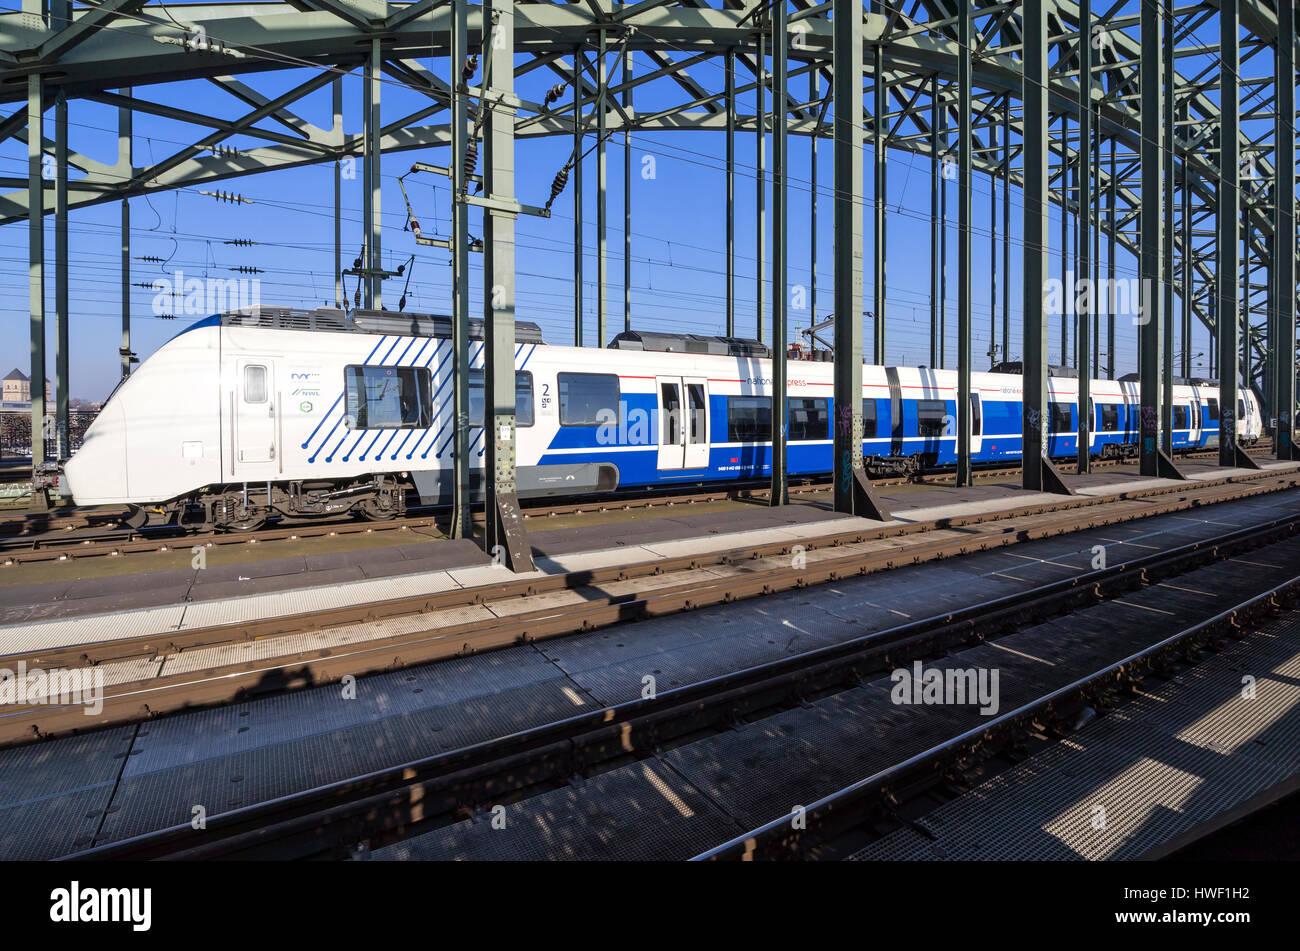 National Express Regionalzug an der Hohenzollern Brücke in Köln. Stockbild